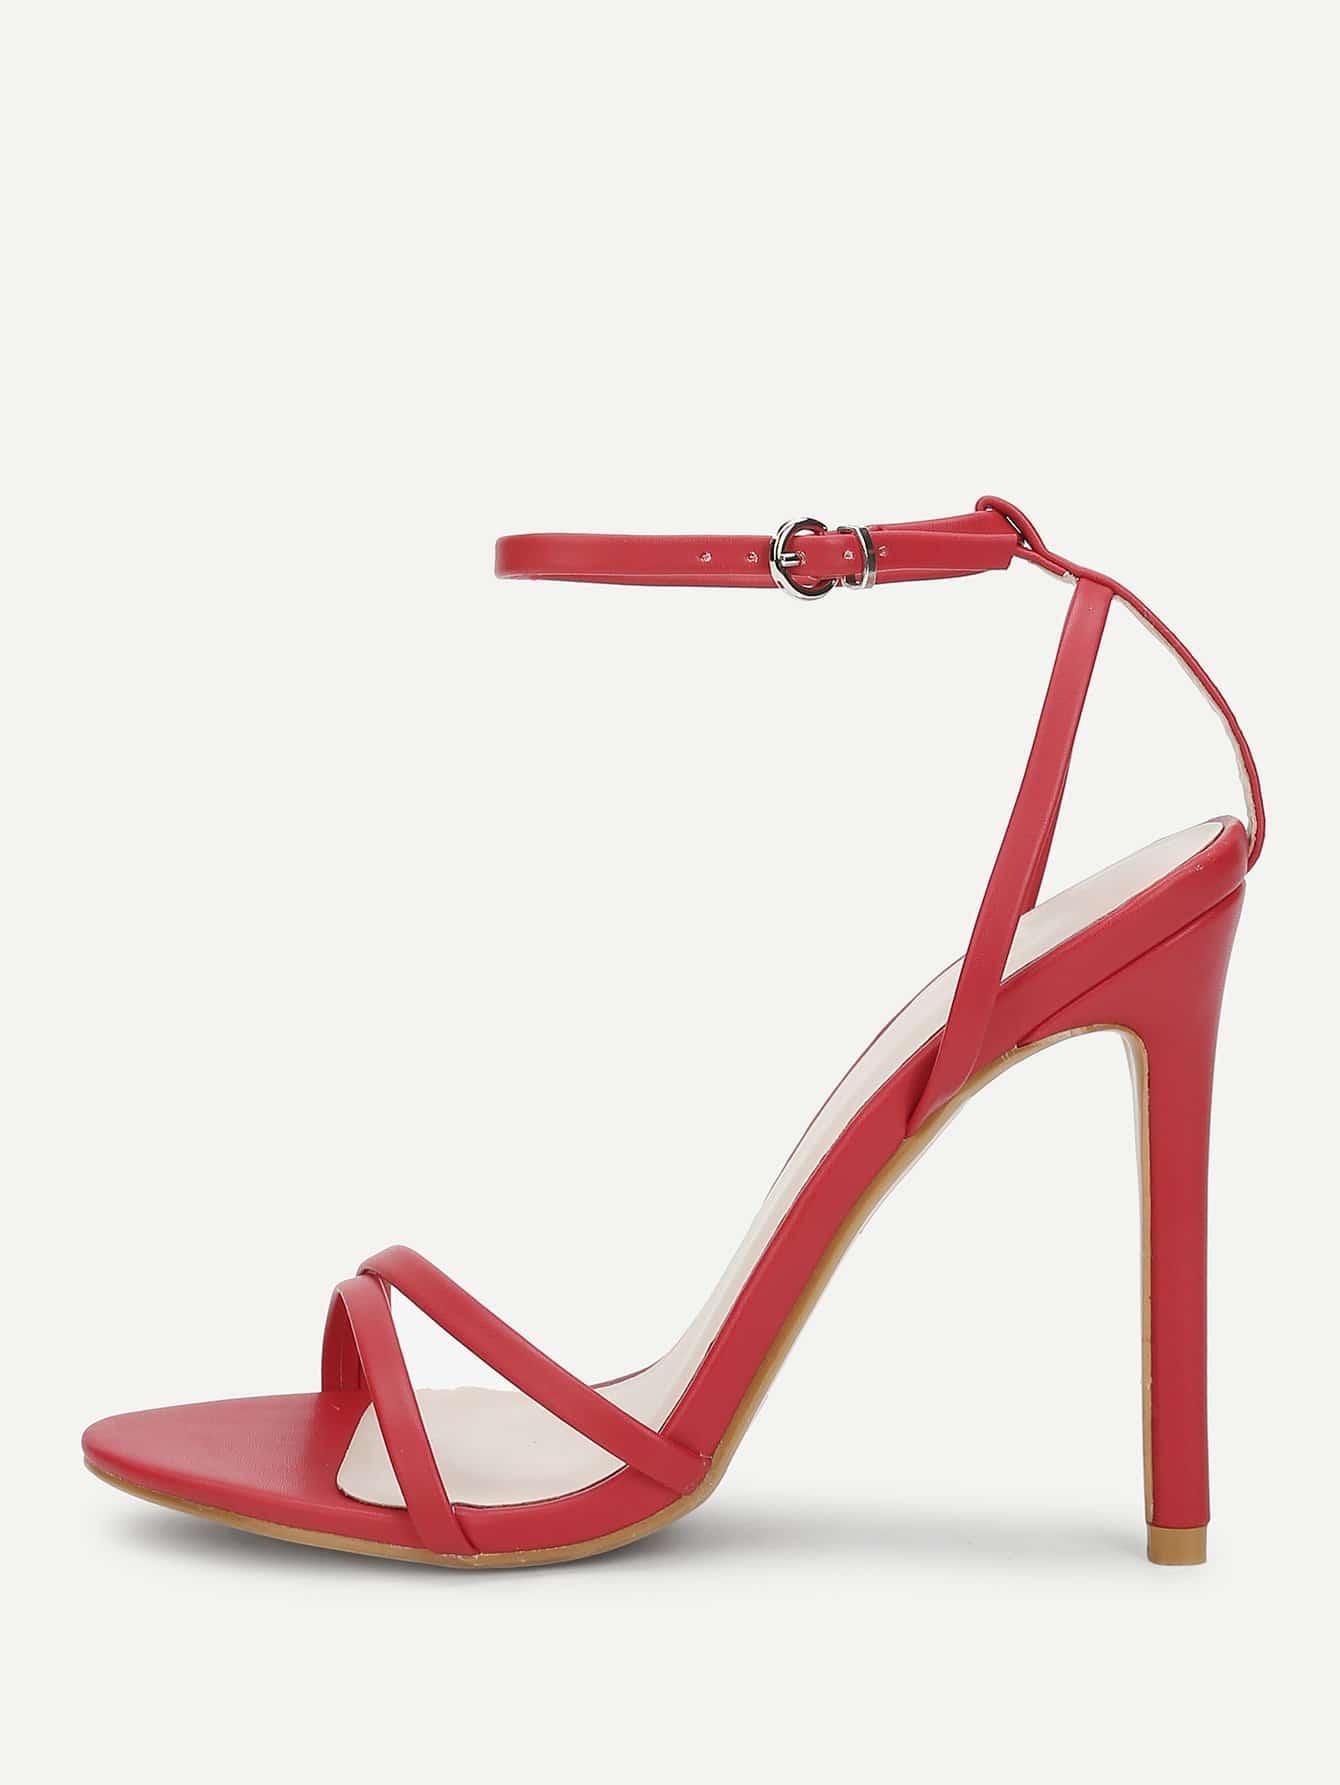 History of high heels fashion 69